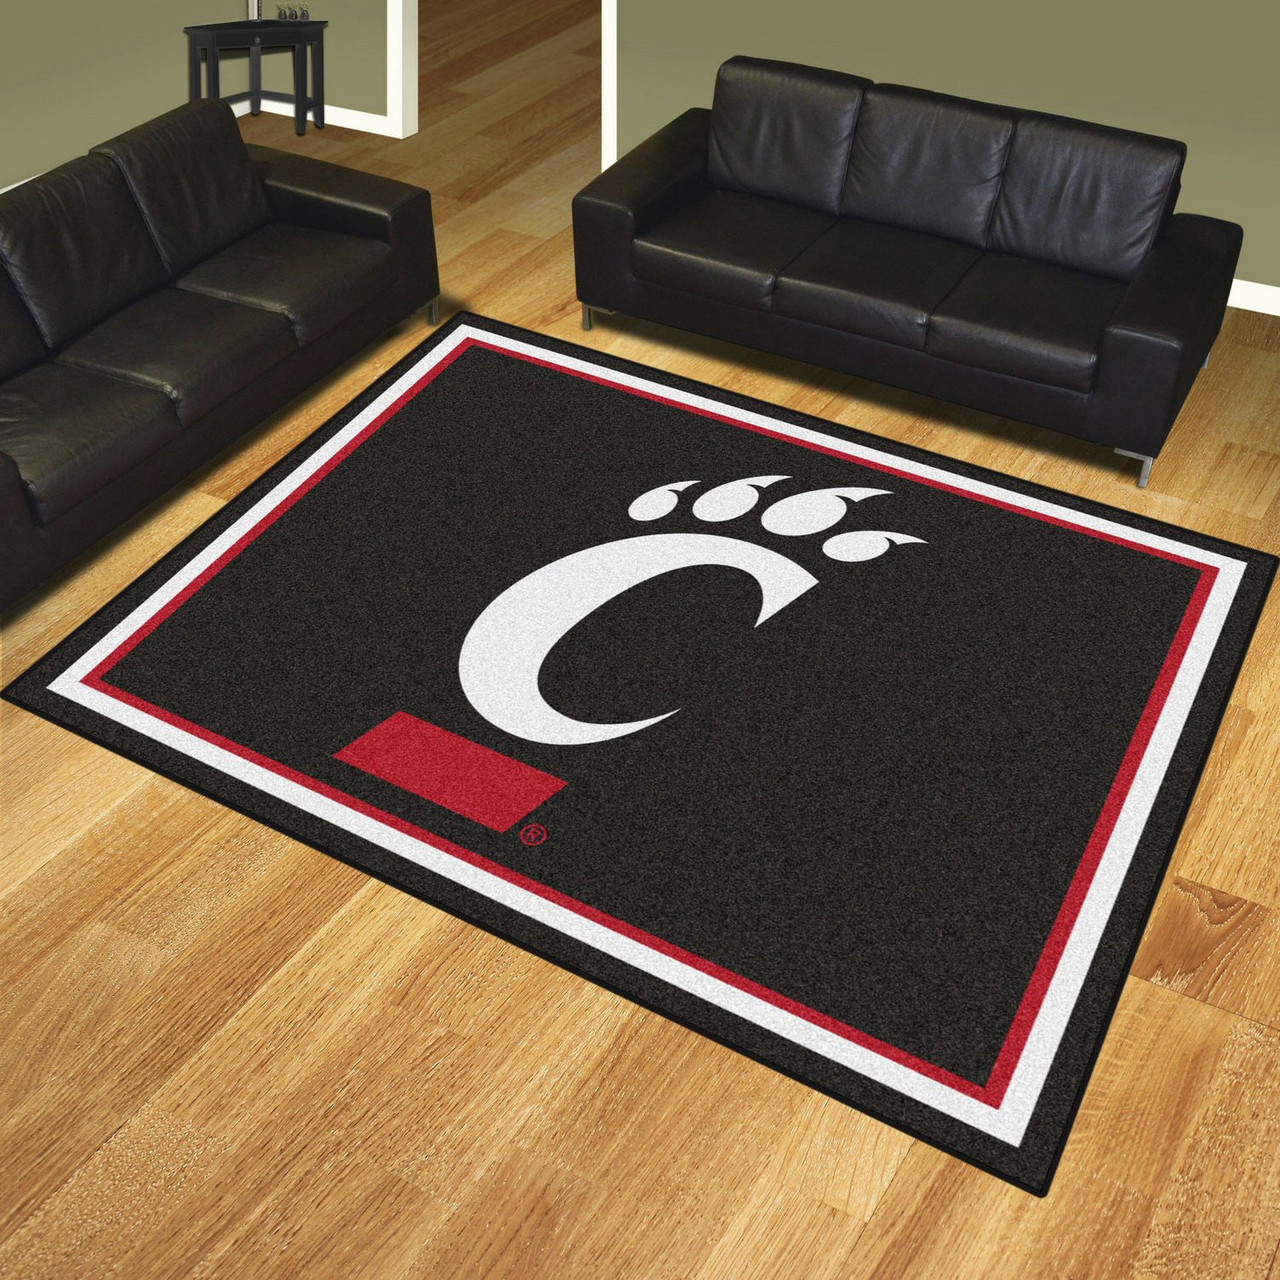 Fan Mats University of Cincinnati Heavy Duty Door Mat